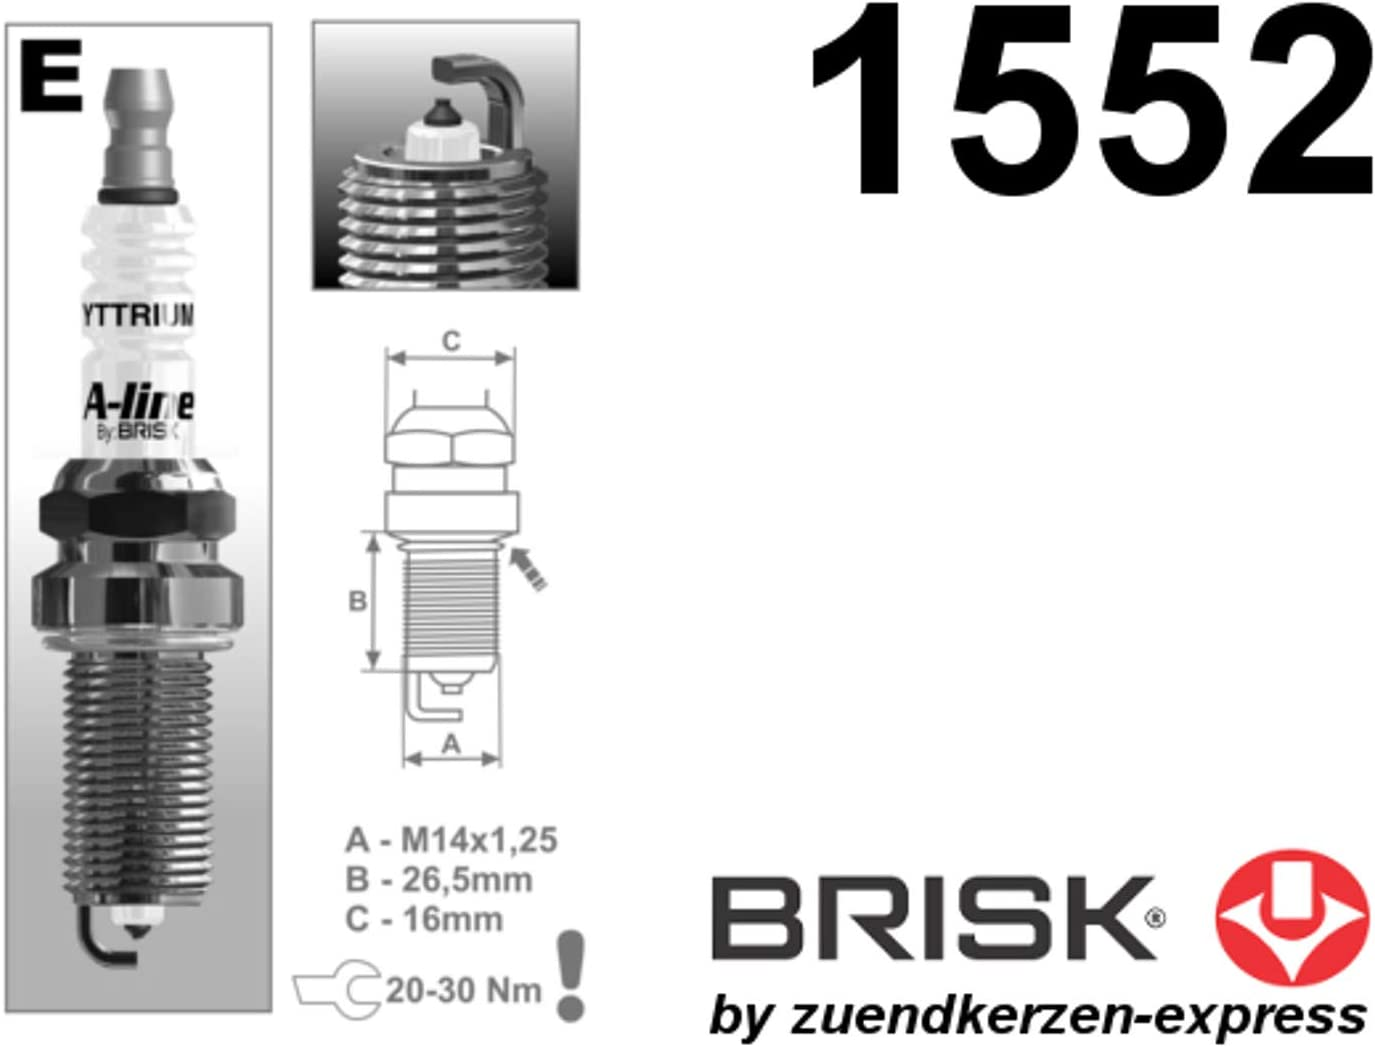 Brisk A Line 40 Yttrium Er15ypy 1 1552 Spark Plugs 4 Pieces Auto